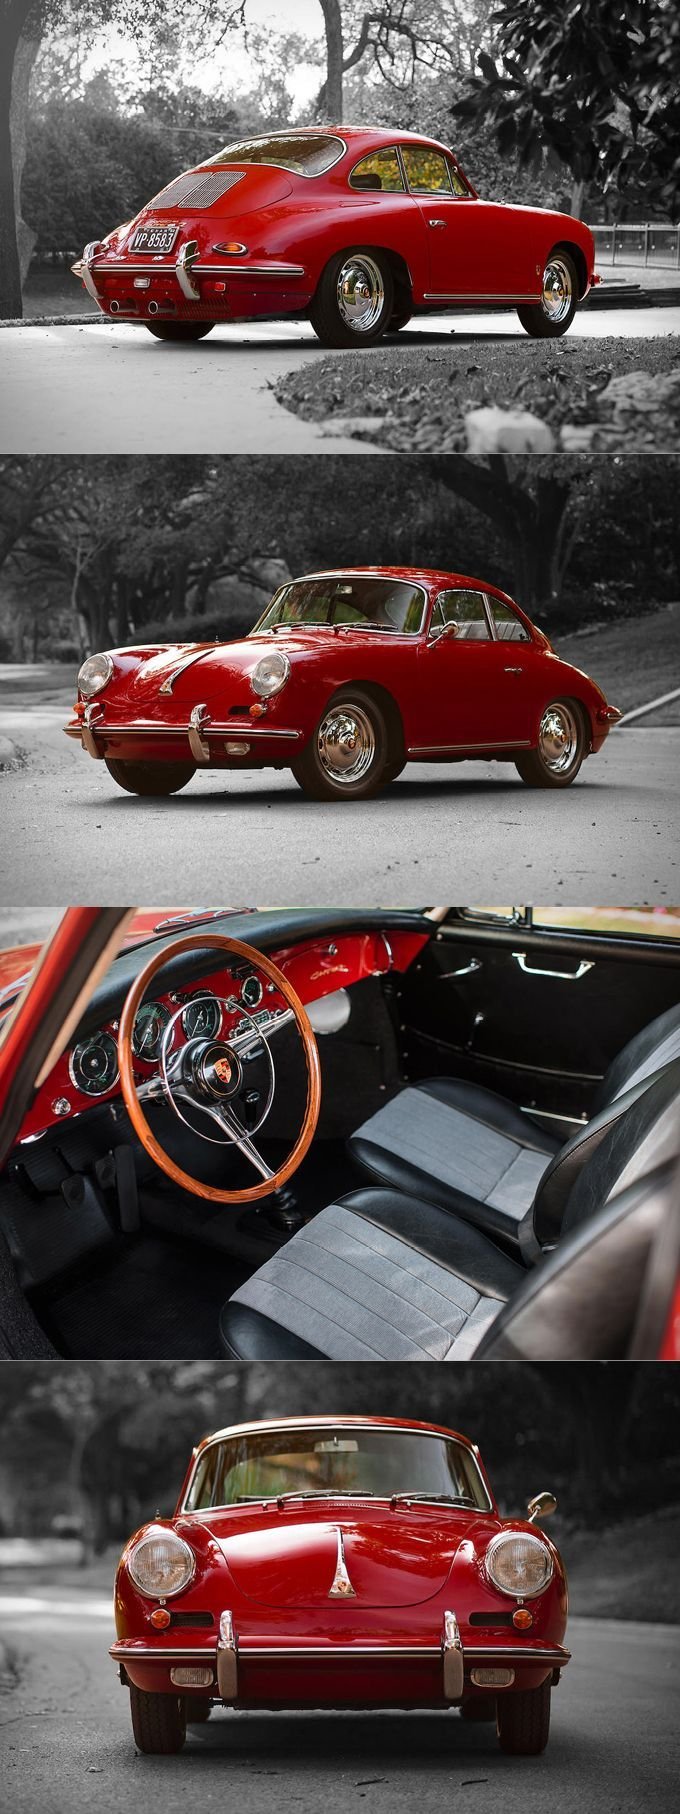 1962 porsche 356 carrera 2 310 produced 130hp 2 0l f4 red